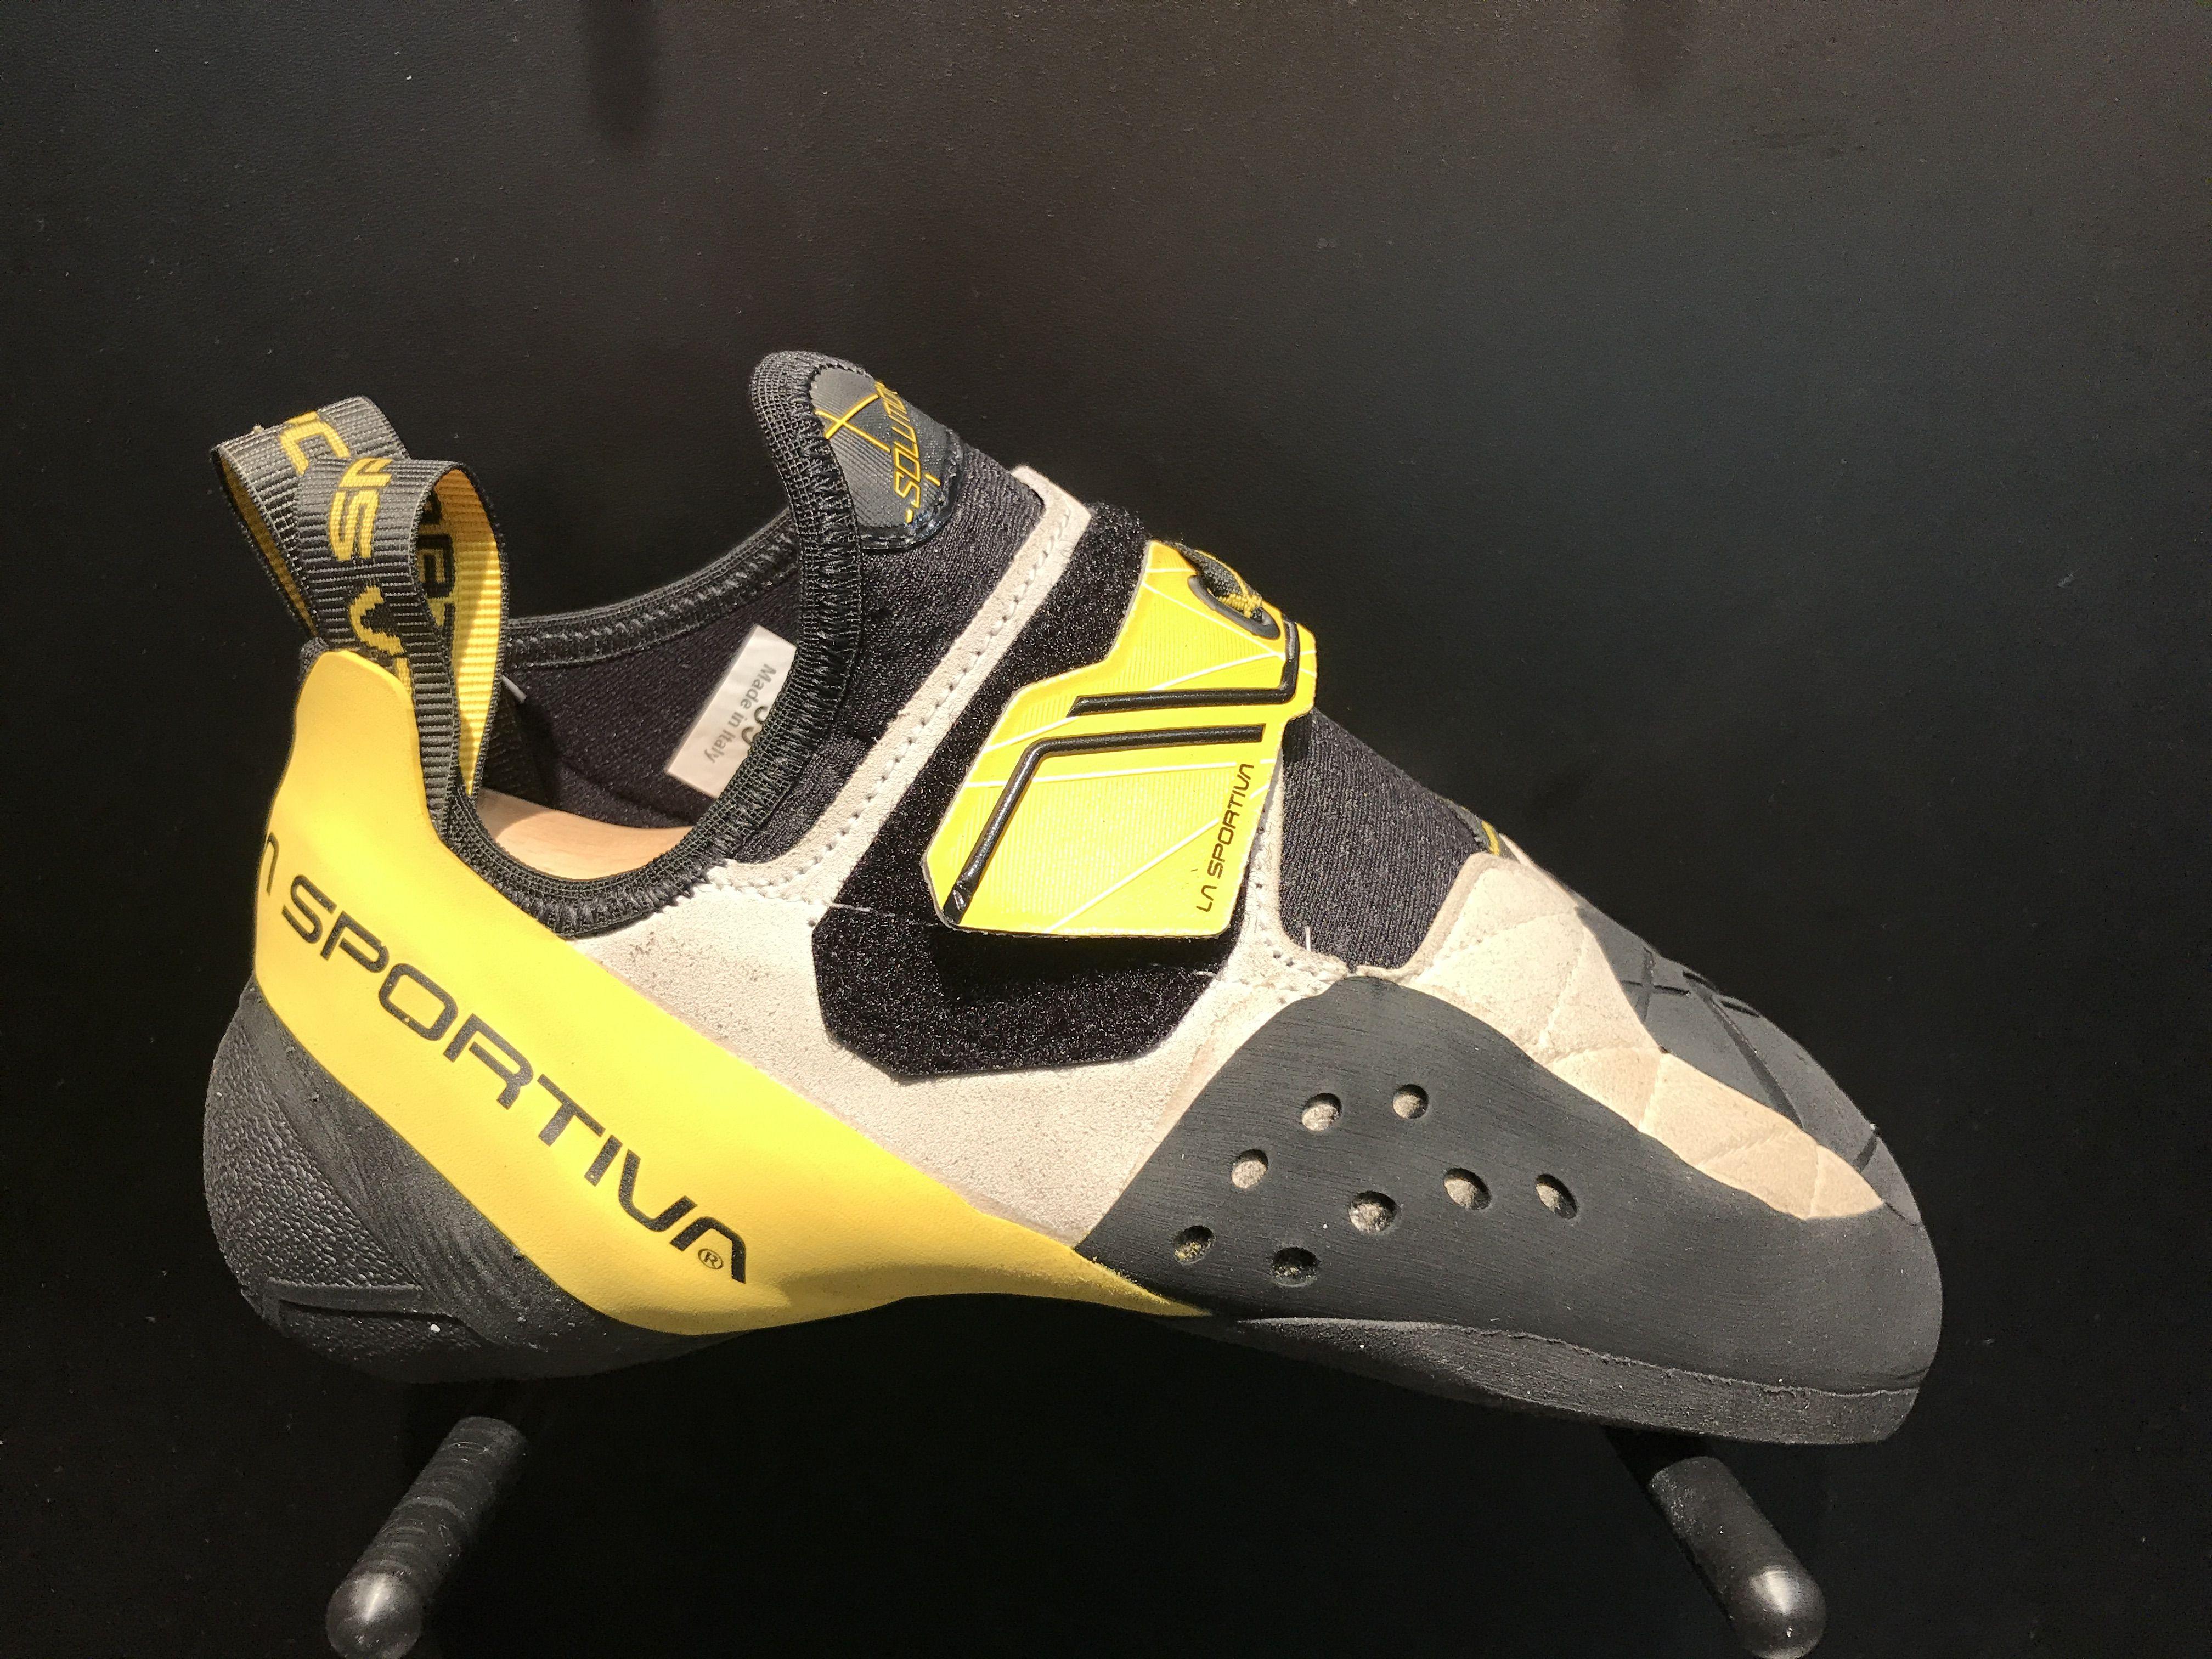 ba79dd93fd La Sportiva s re-design of their best seller Solution Men. Coming spring  2018 to Casper s Climbing Shop